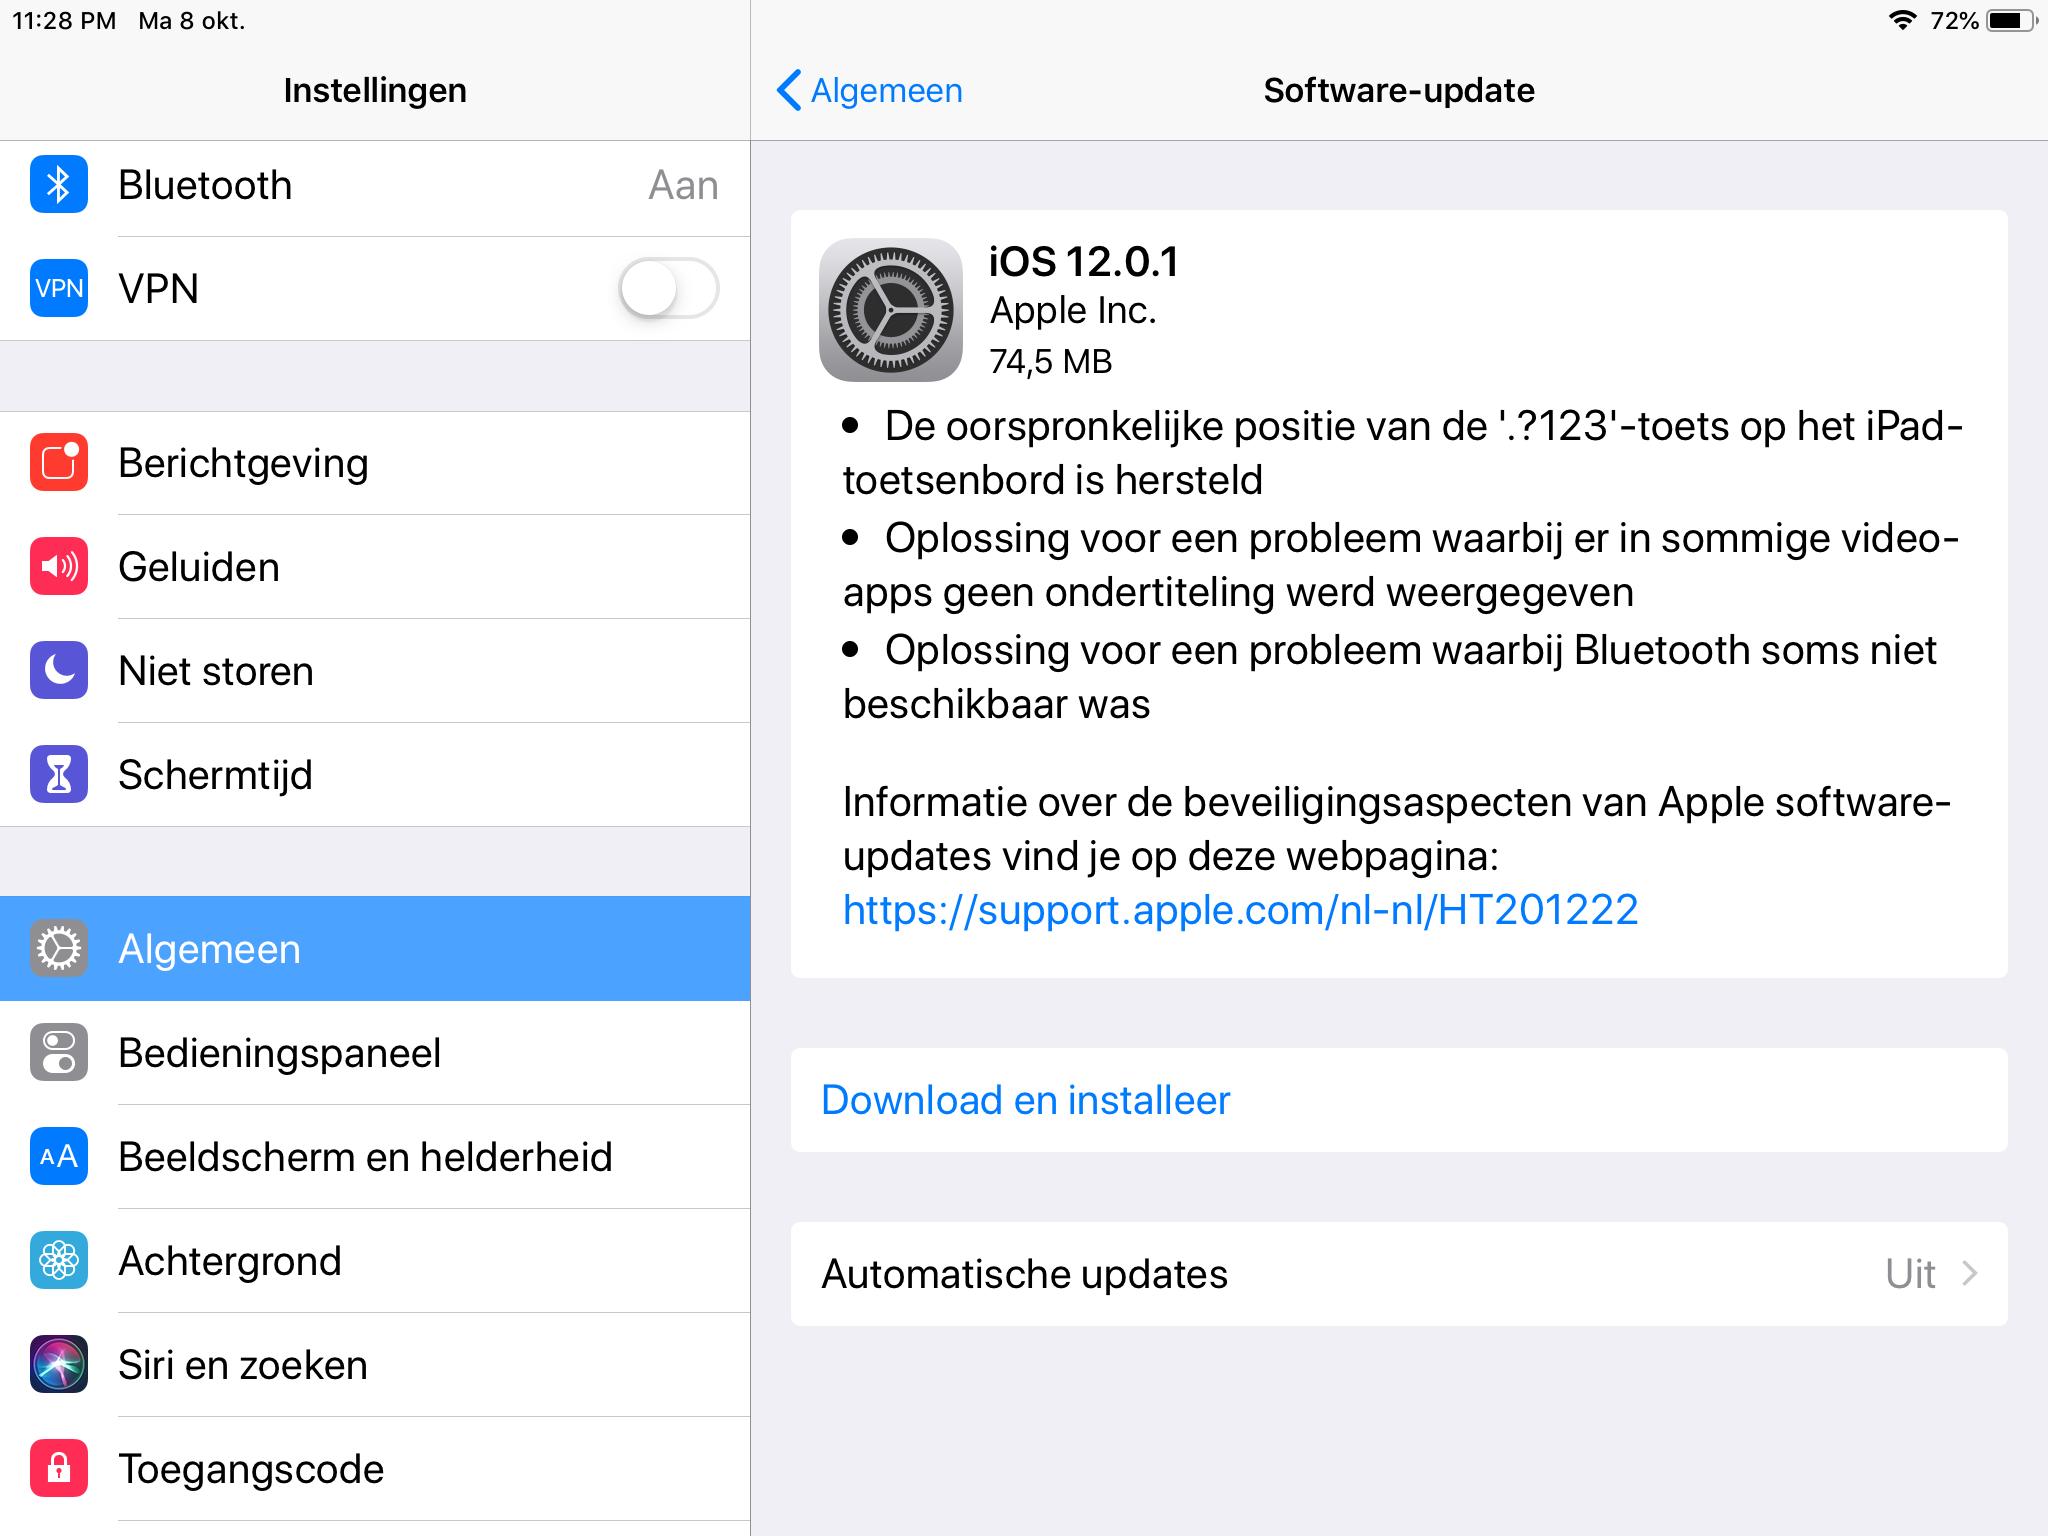 https://www.macfreak.nl/modules/news/images/zArt.iOS12.0.1ReleaseNotes-2.PNG